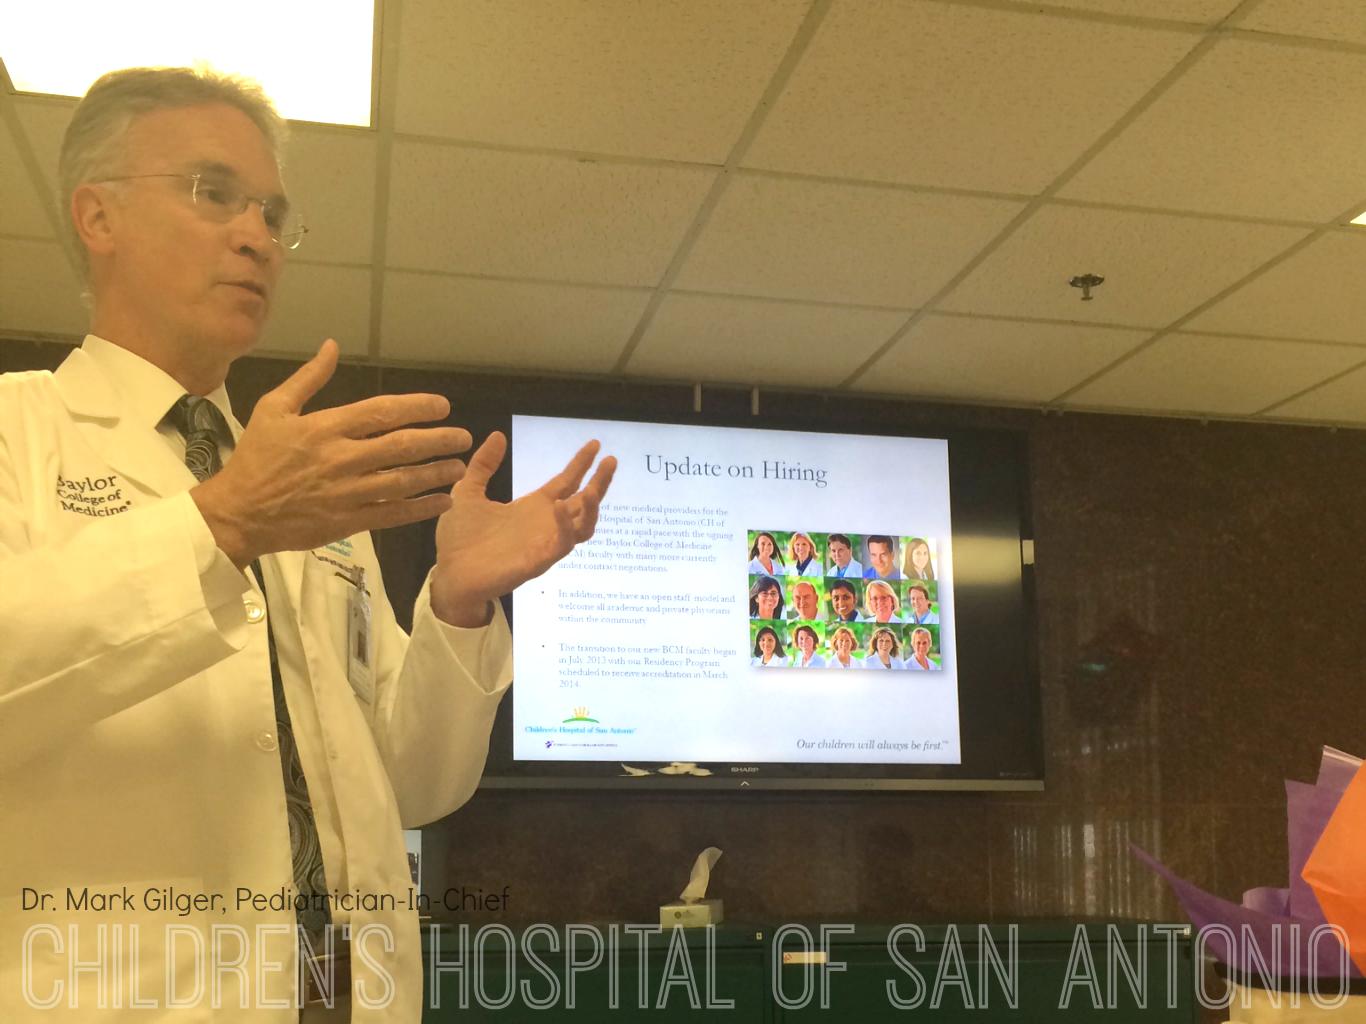 Transformation of the Children's Hospital of San Antonio formerly Santa Rosa Hospital